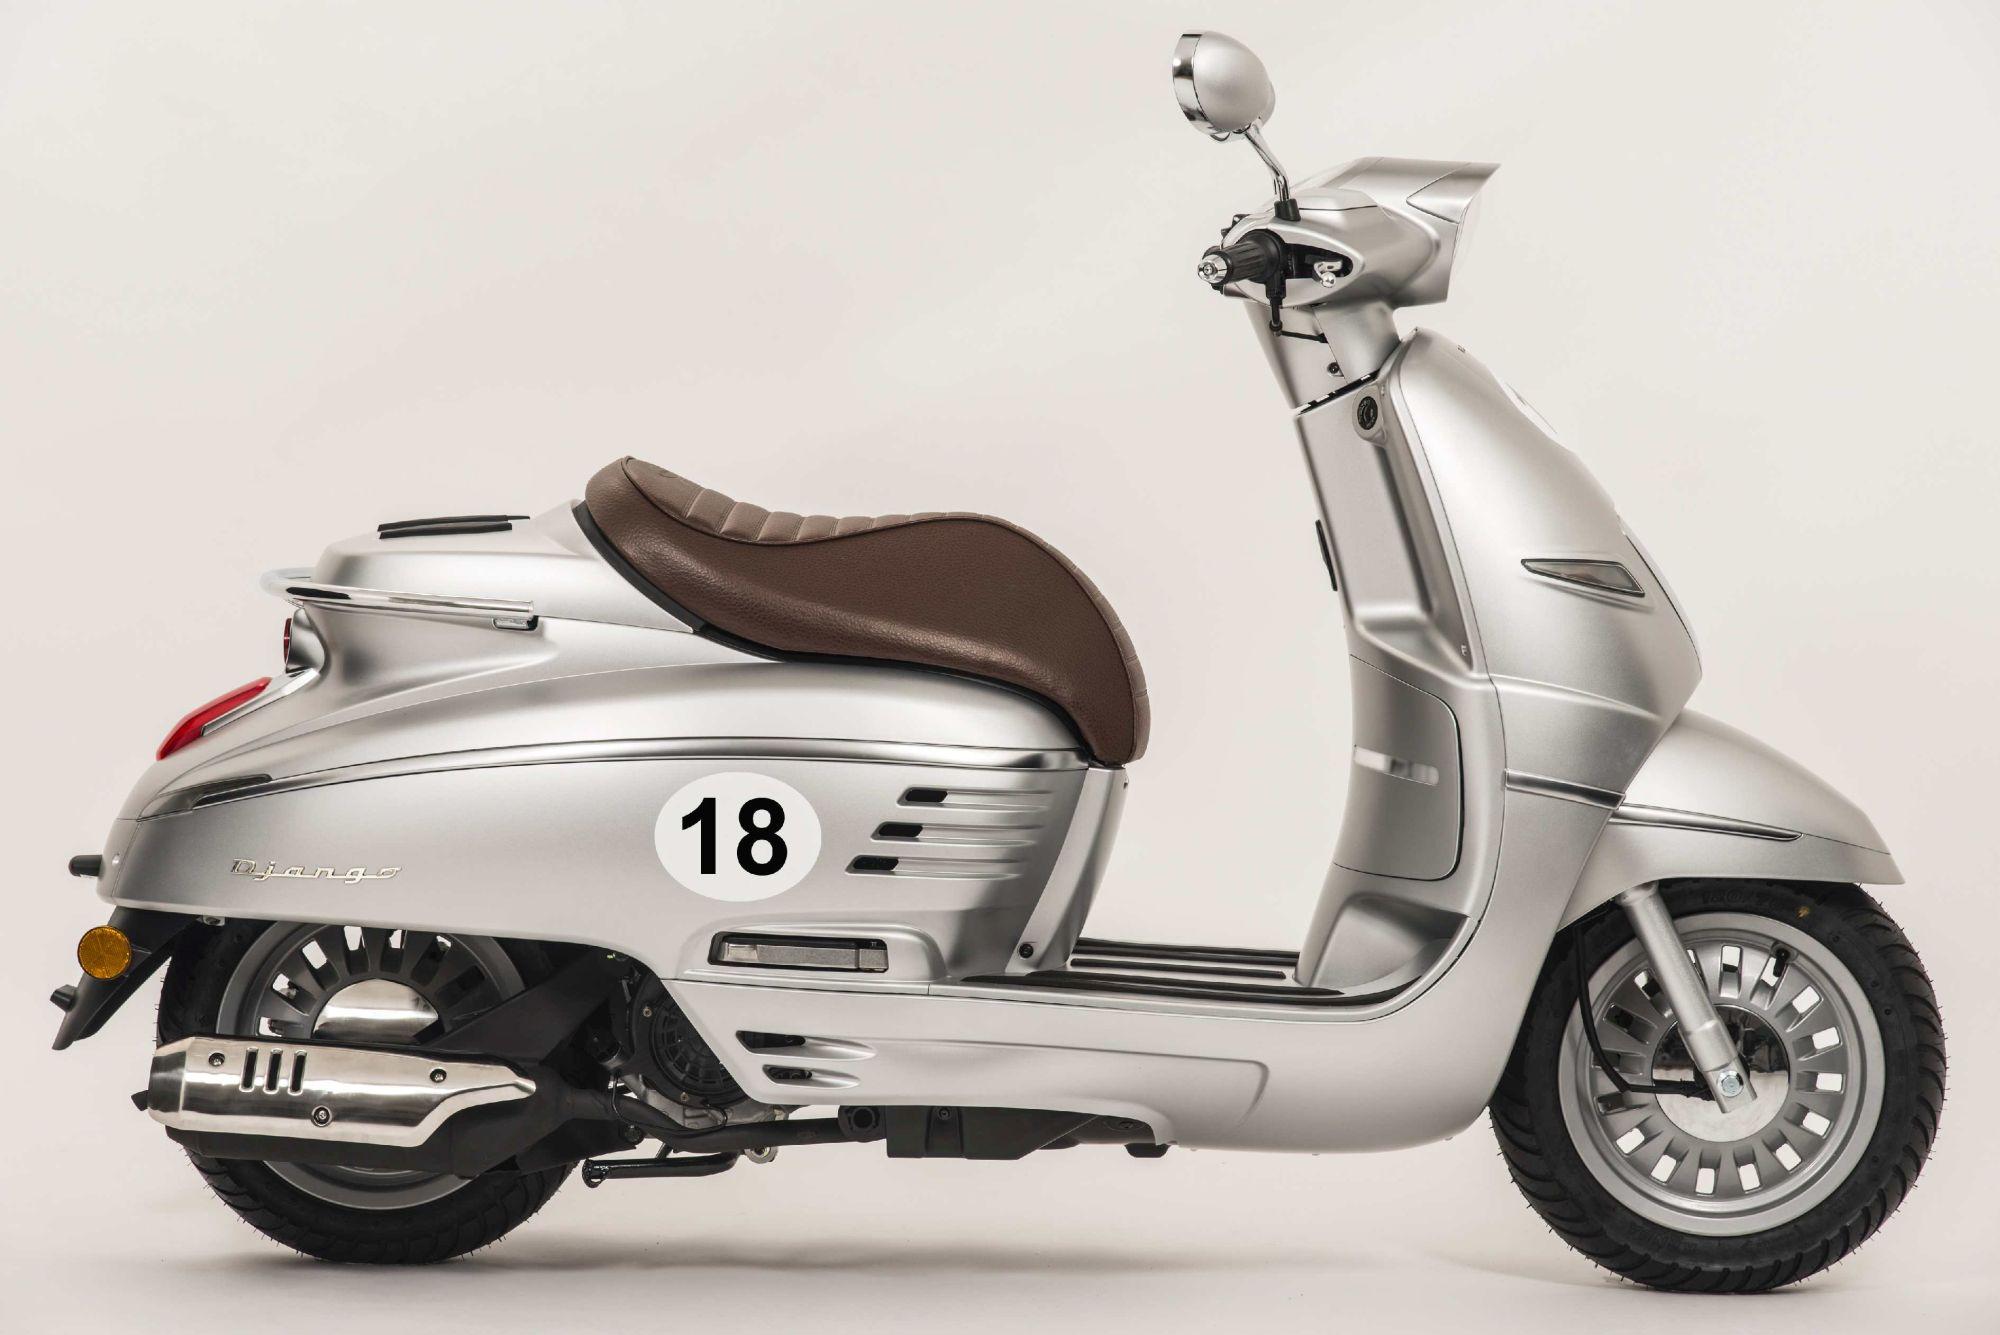 Permalink to Yamaha Sport Terbaru